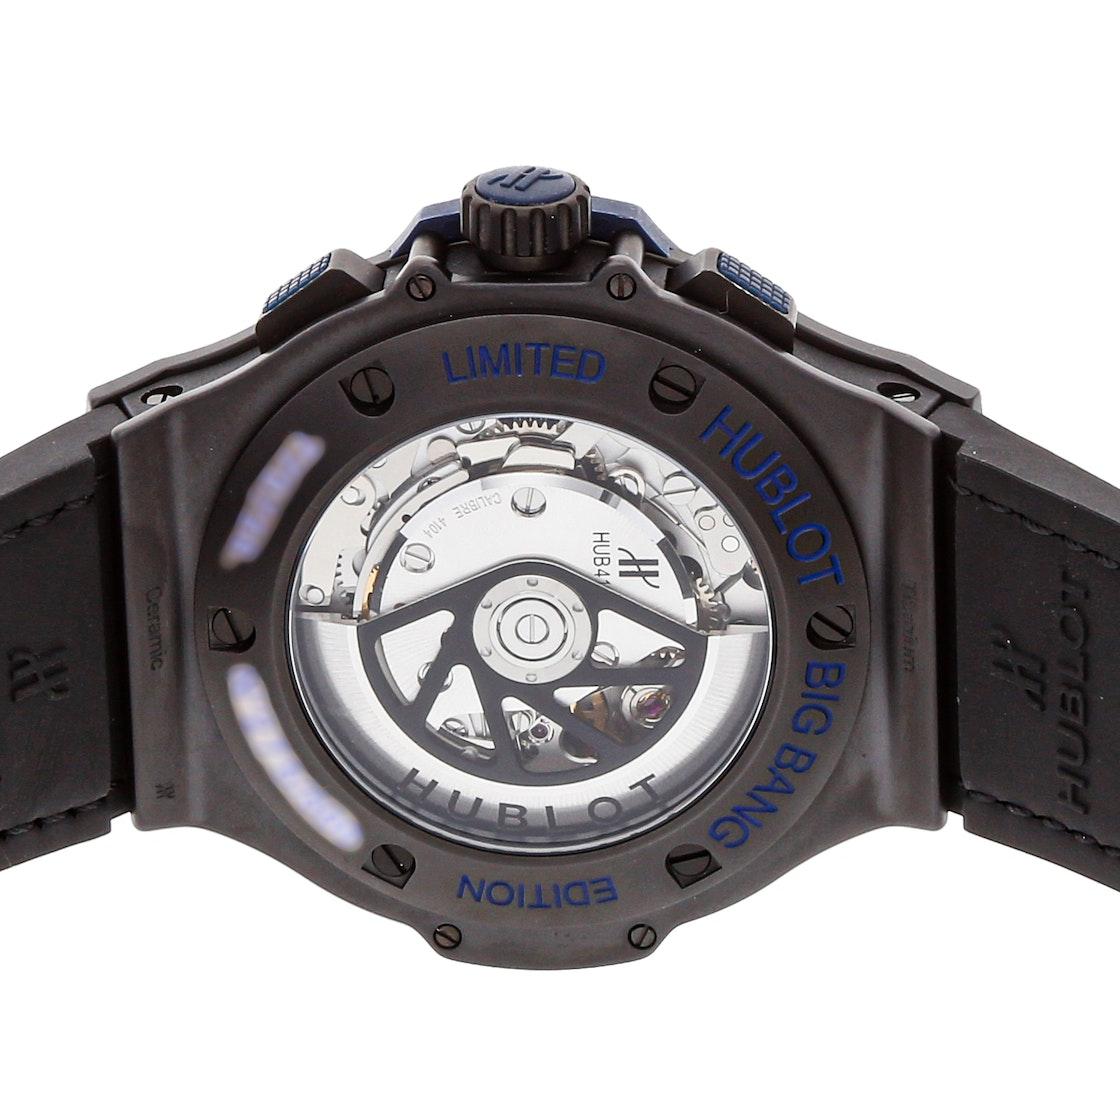 Hublot Big Bang Limited Edition 301.CI.1190.GR.ABB09